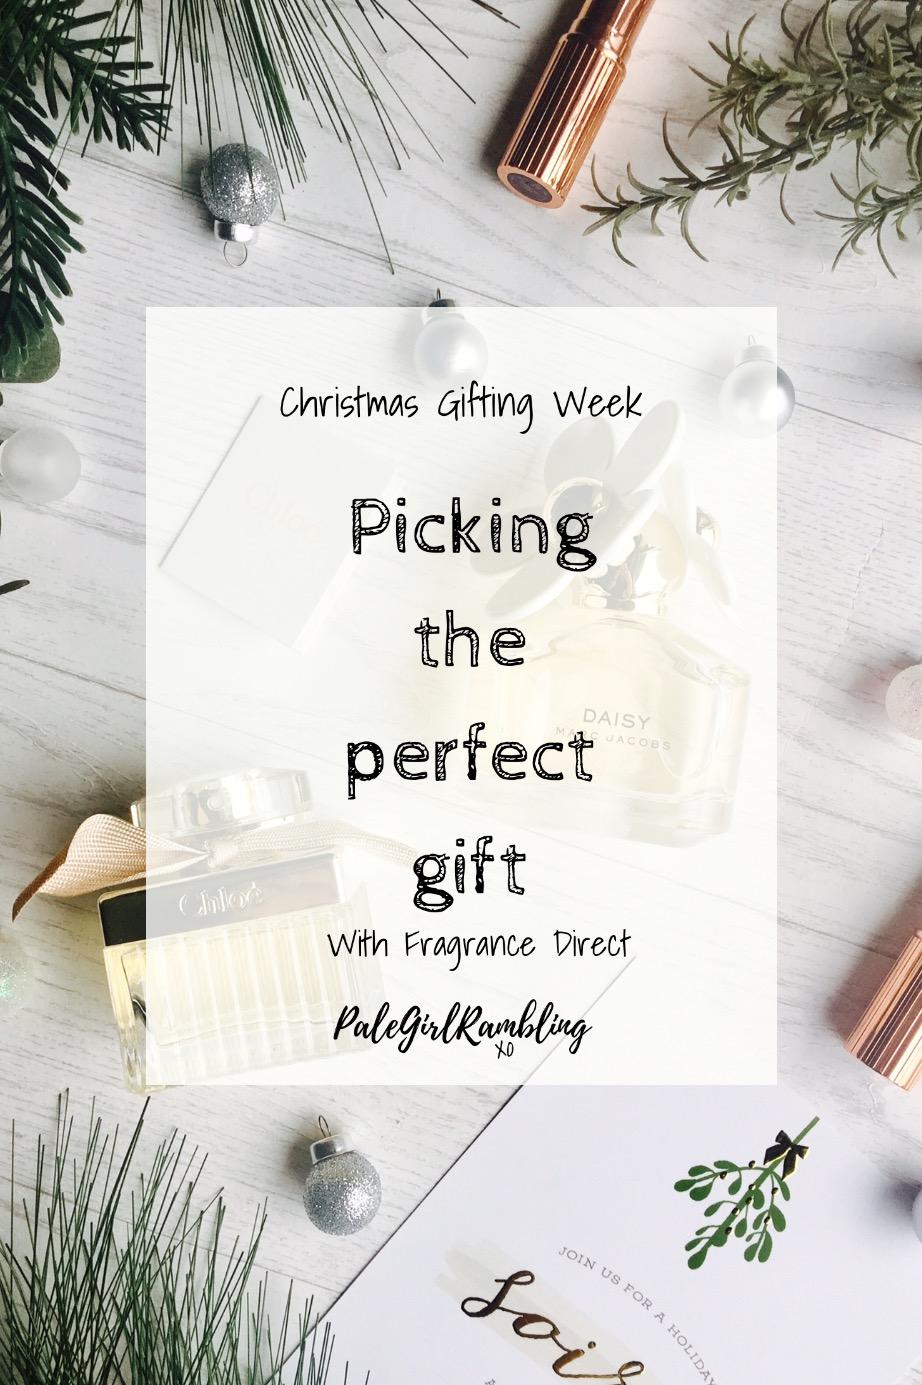 Christmas Gifting Week Fragrance Direct Marc Jacobs Chloe Daisy present ideas